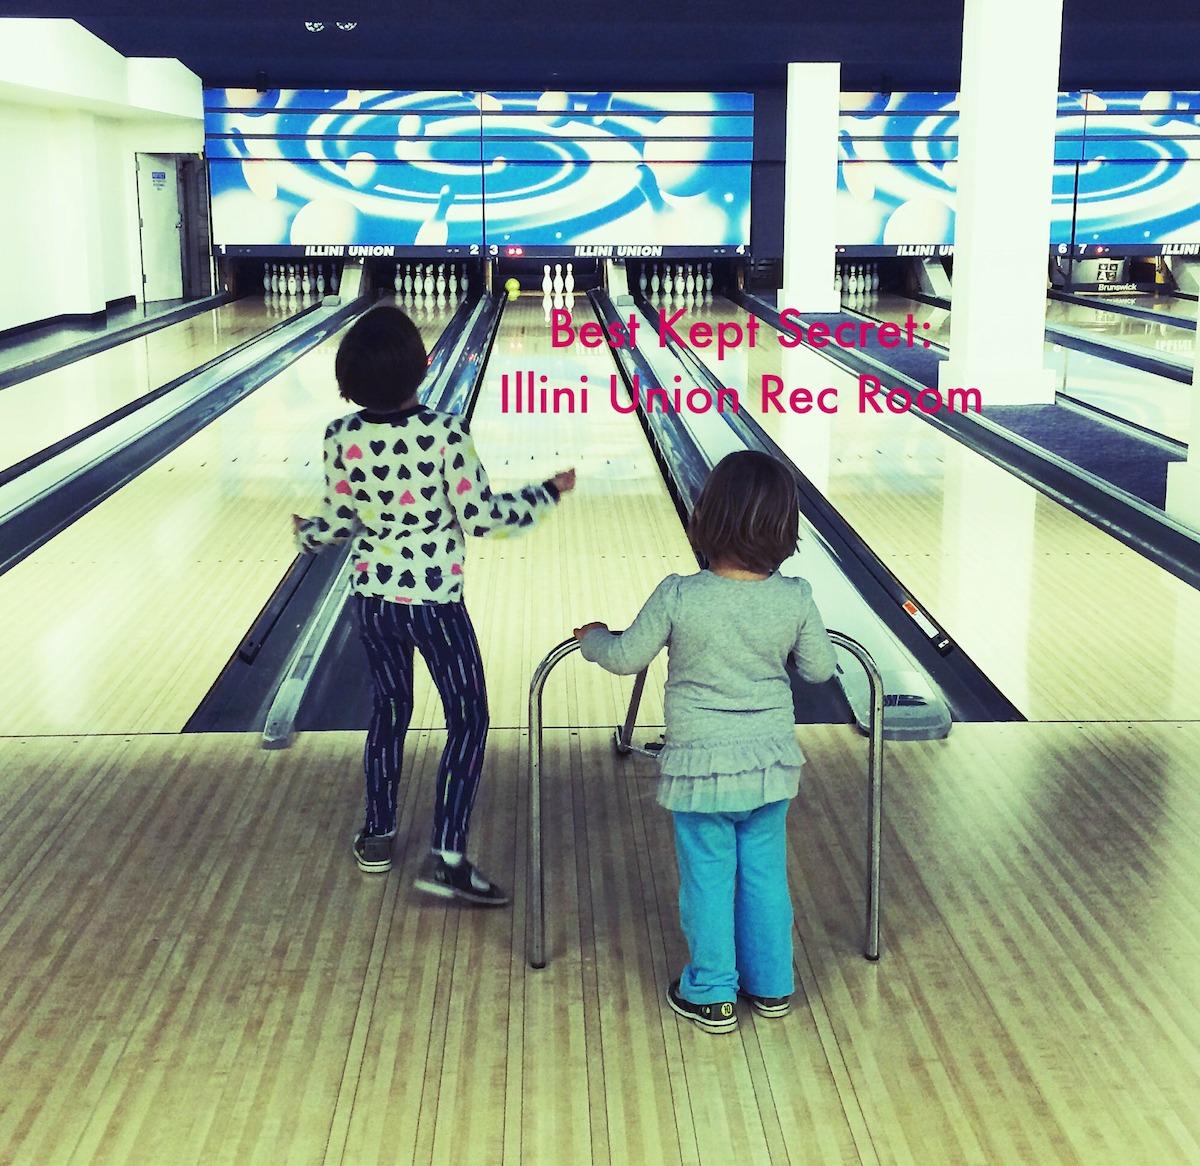 Illini Union Rec Room Champaign Urbana bowling